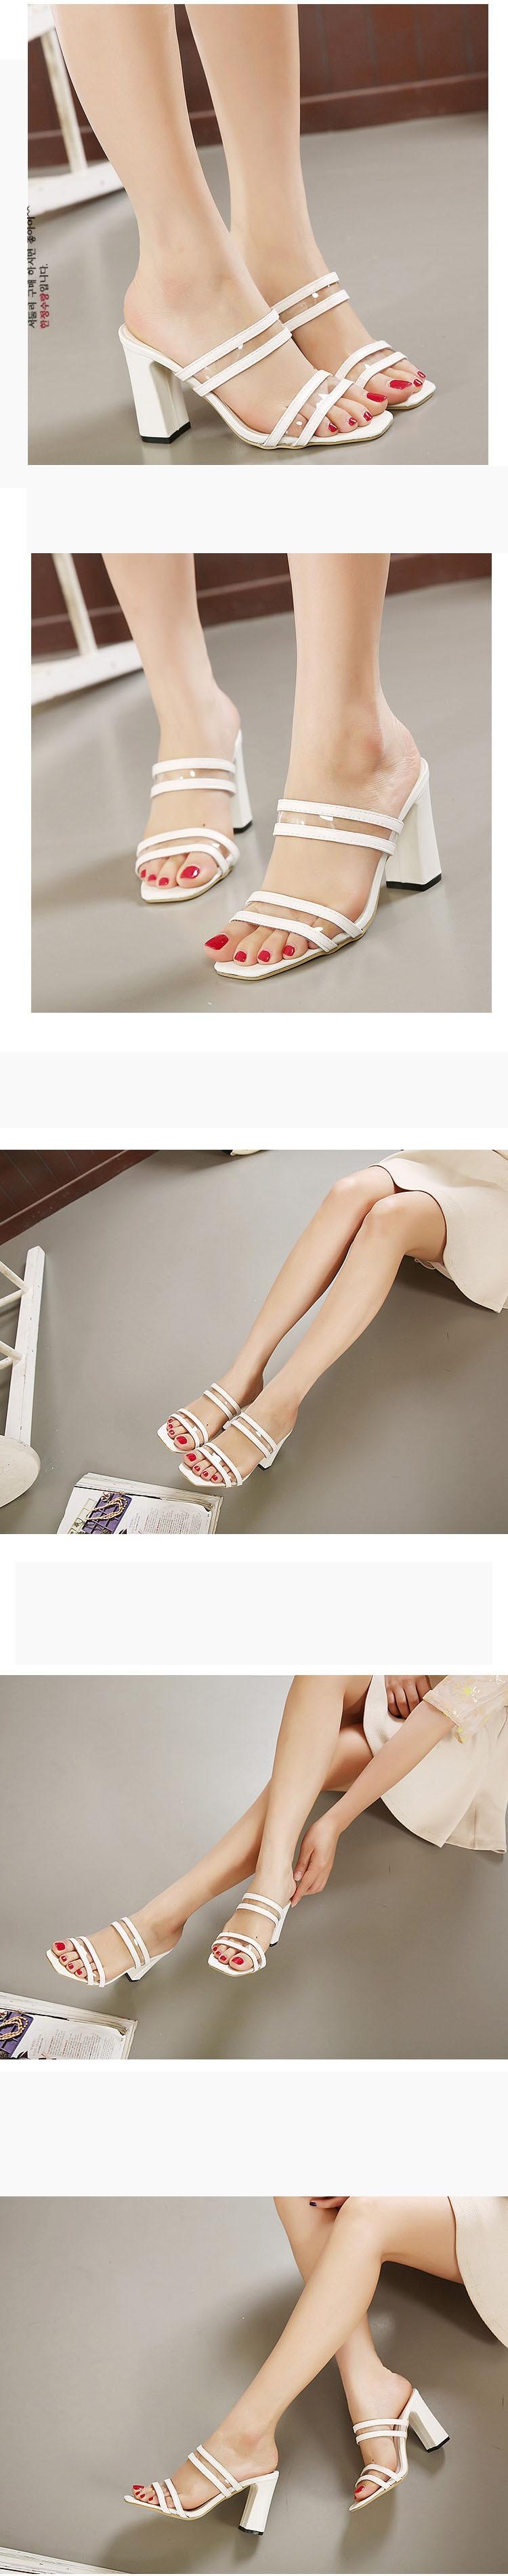 HTB1t4R cRLN8KJjSZFpq6zZaVXaT Eilyken 2019 Summer Rome Sandals Women Leisure slippers Fashion Women's Sandals Slides shoes Square heel 9.5cm